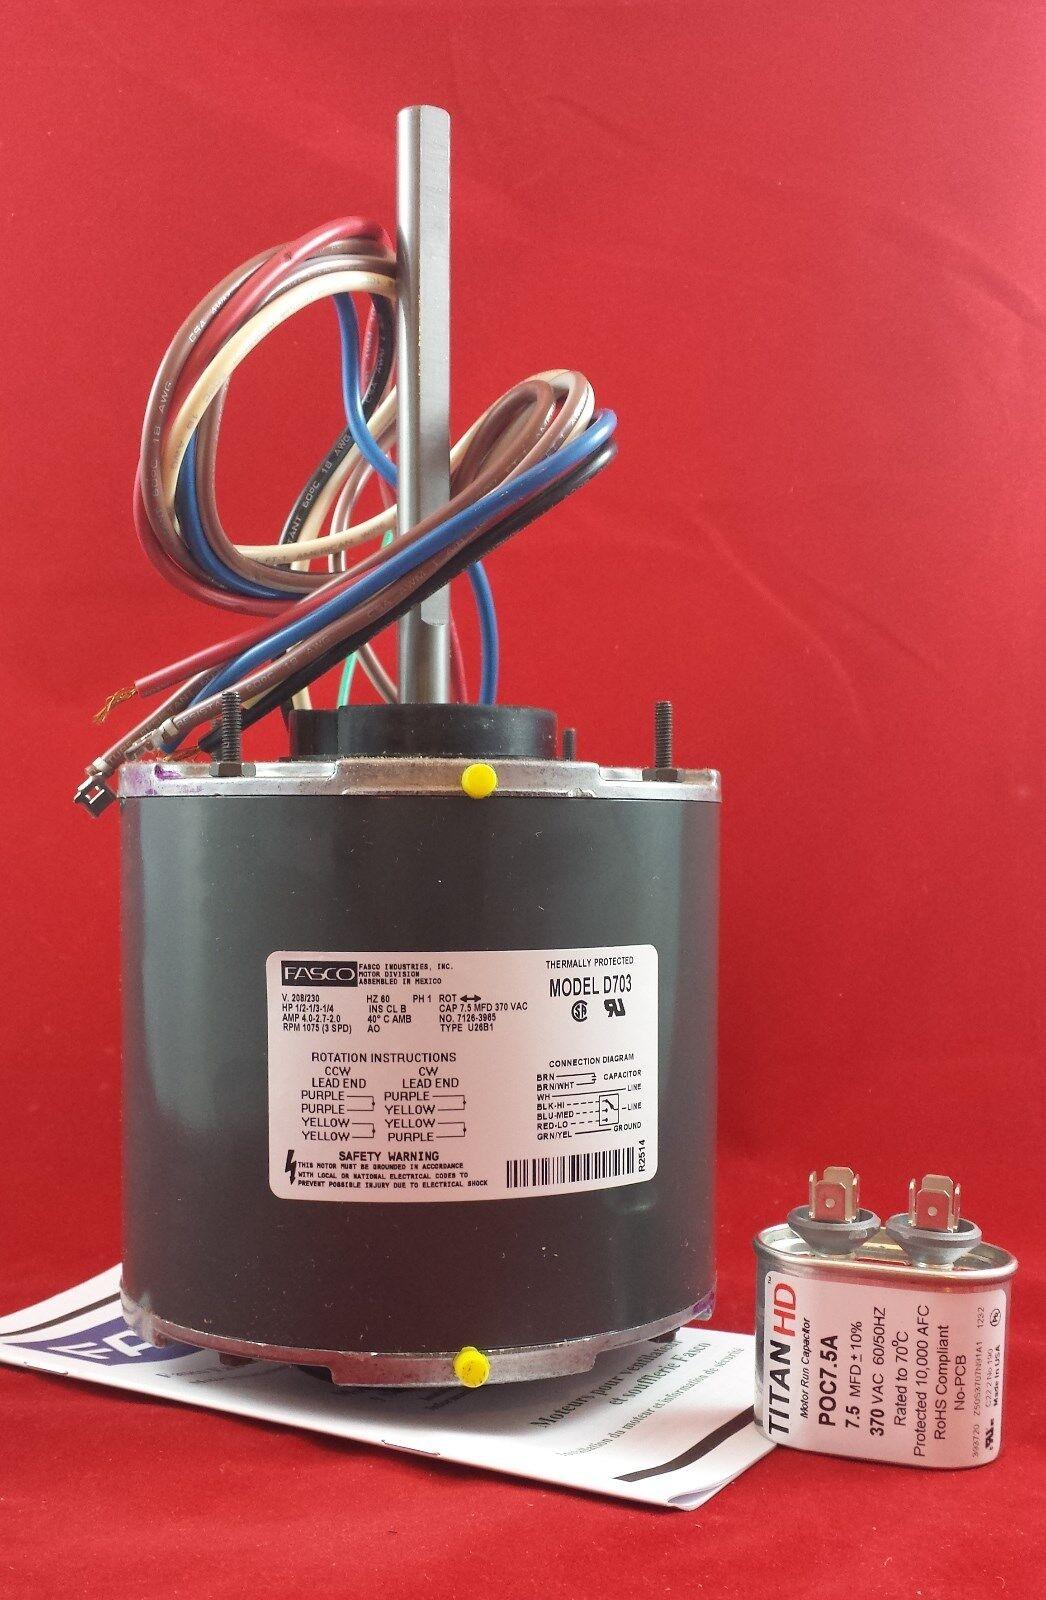 D Fasco Blower Motor Wiring Diagram on